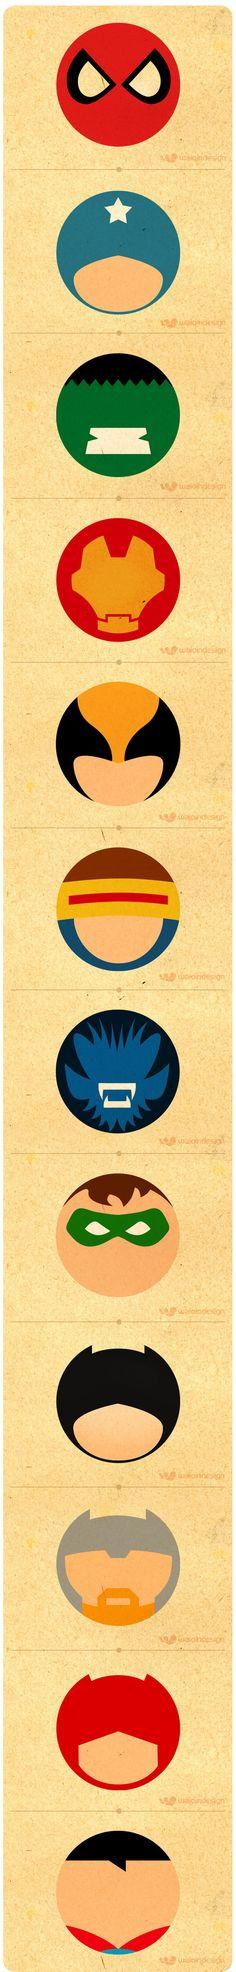 Super Heróis - Minimalismo by Waio , via Behance